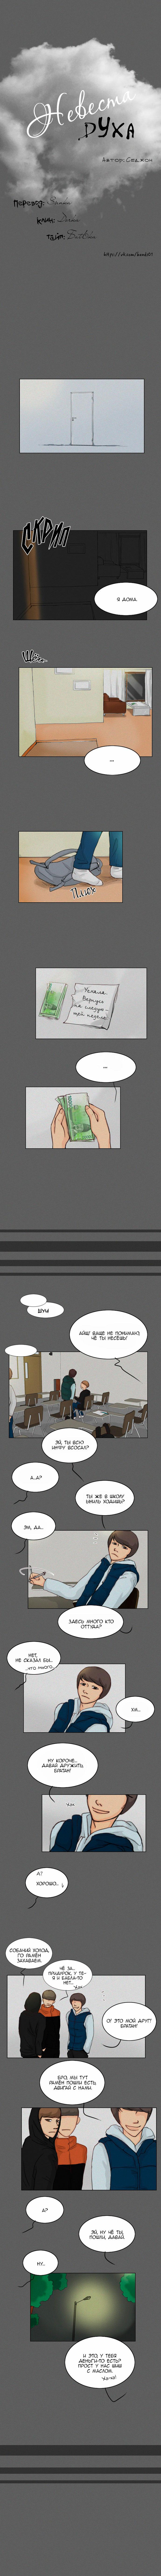 https://r1.ninemanga.com/comics/pic2/8/31048/426343/1535044281862.jpg Page 2